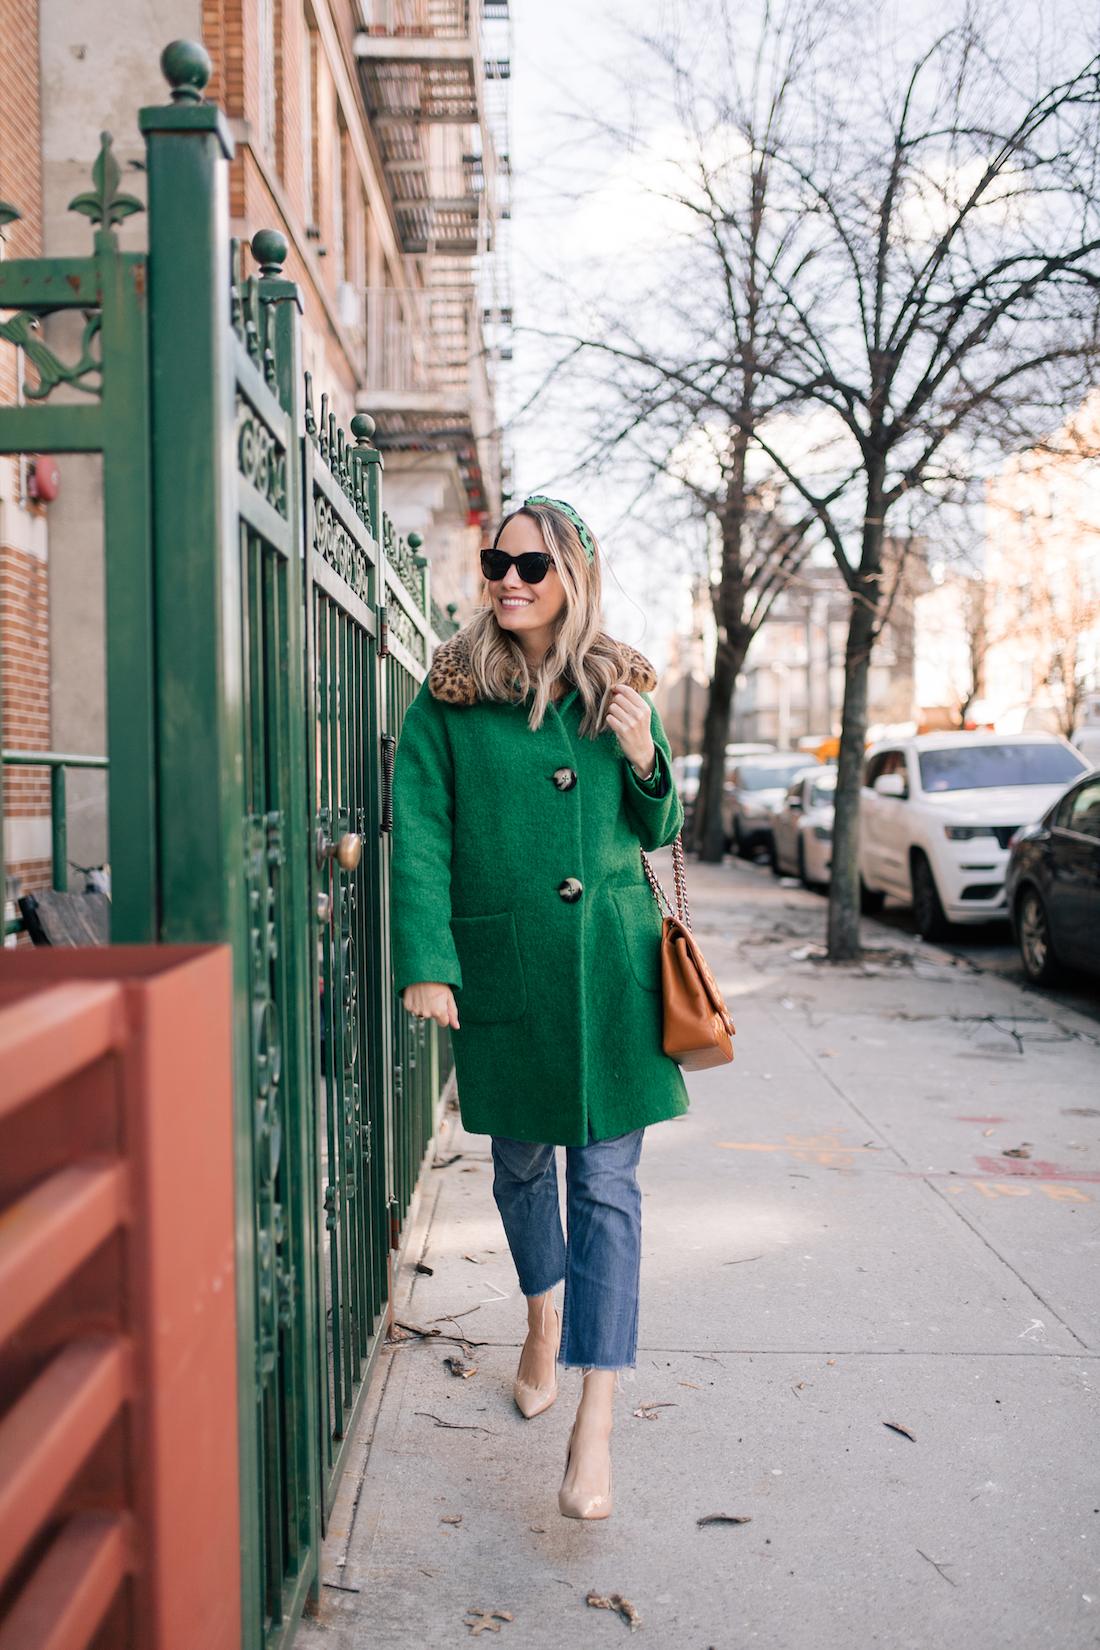 Outfit Details: L.K. Bennett Coat // Tanya Taylor Headband // Re/Done Jeans // J.Crew Belt // Estee LaLonde x Daisy Jewellery Necklaces // Manolo Blahnik Pumps // Chanel Purse // Polaroid Sunglasses